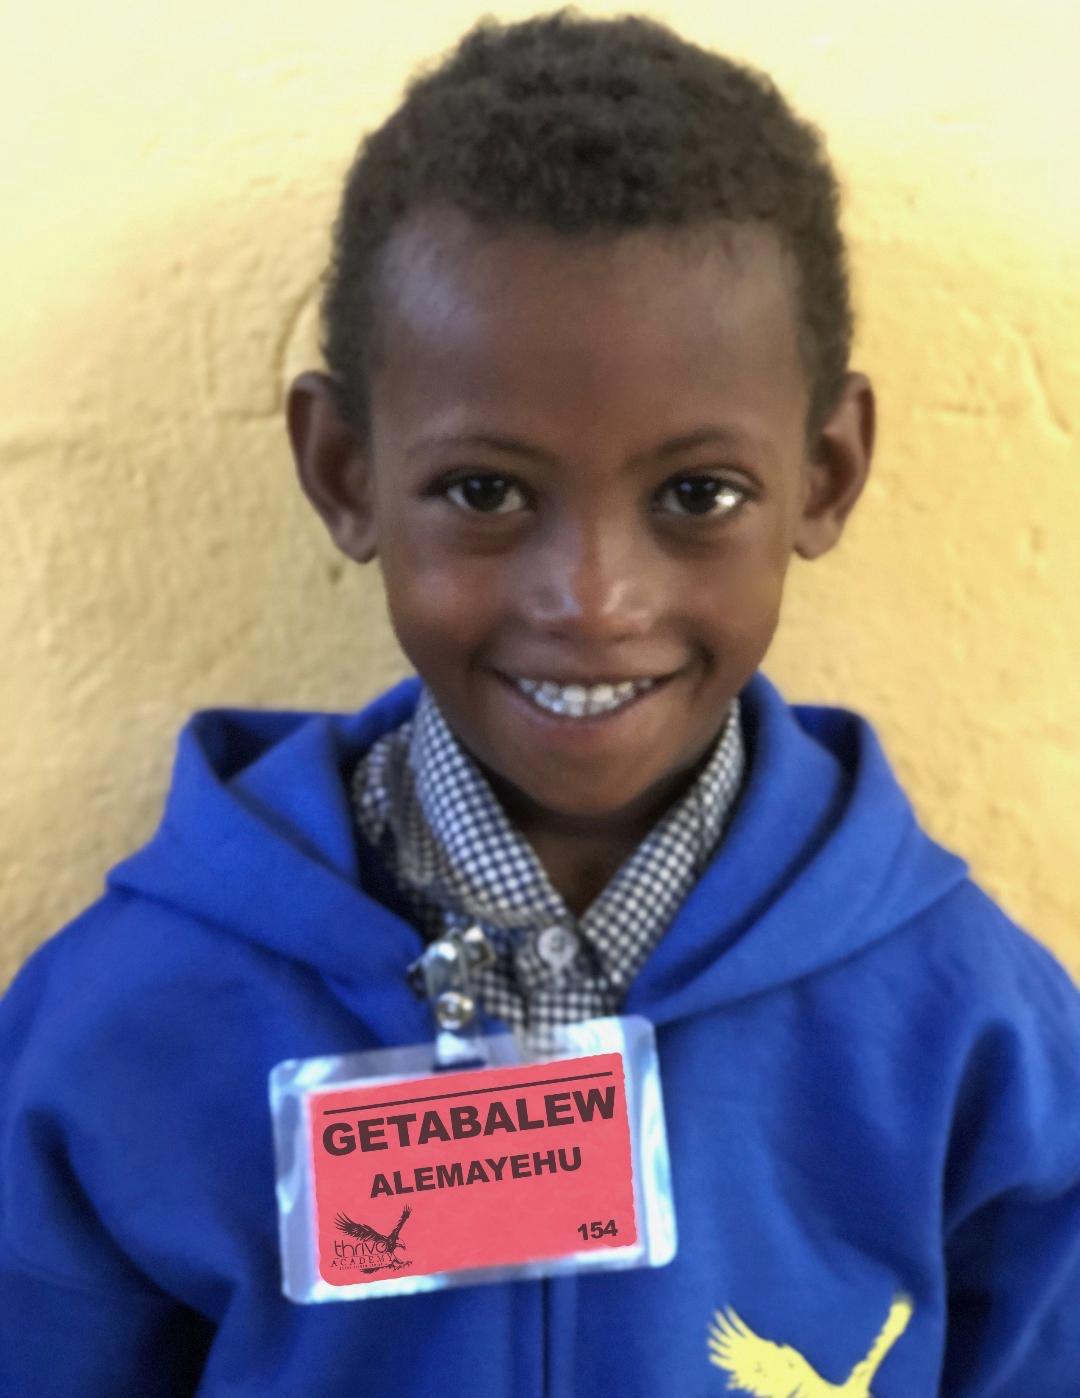 Getabalew Alemayehu #154